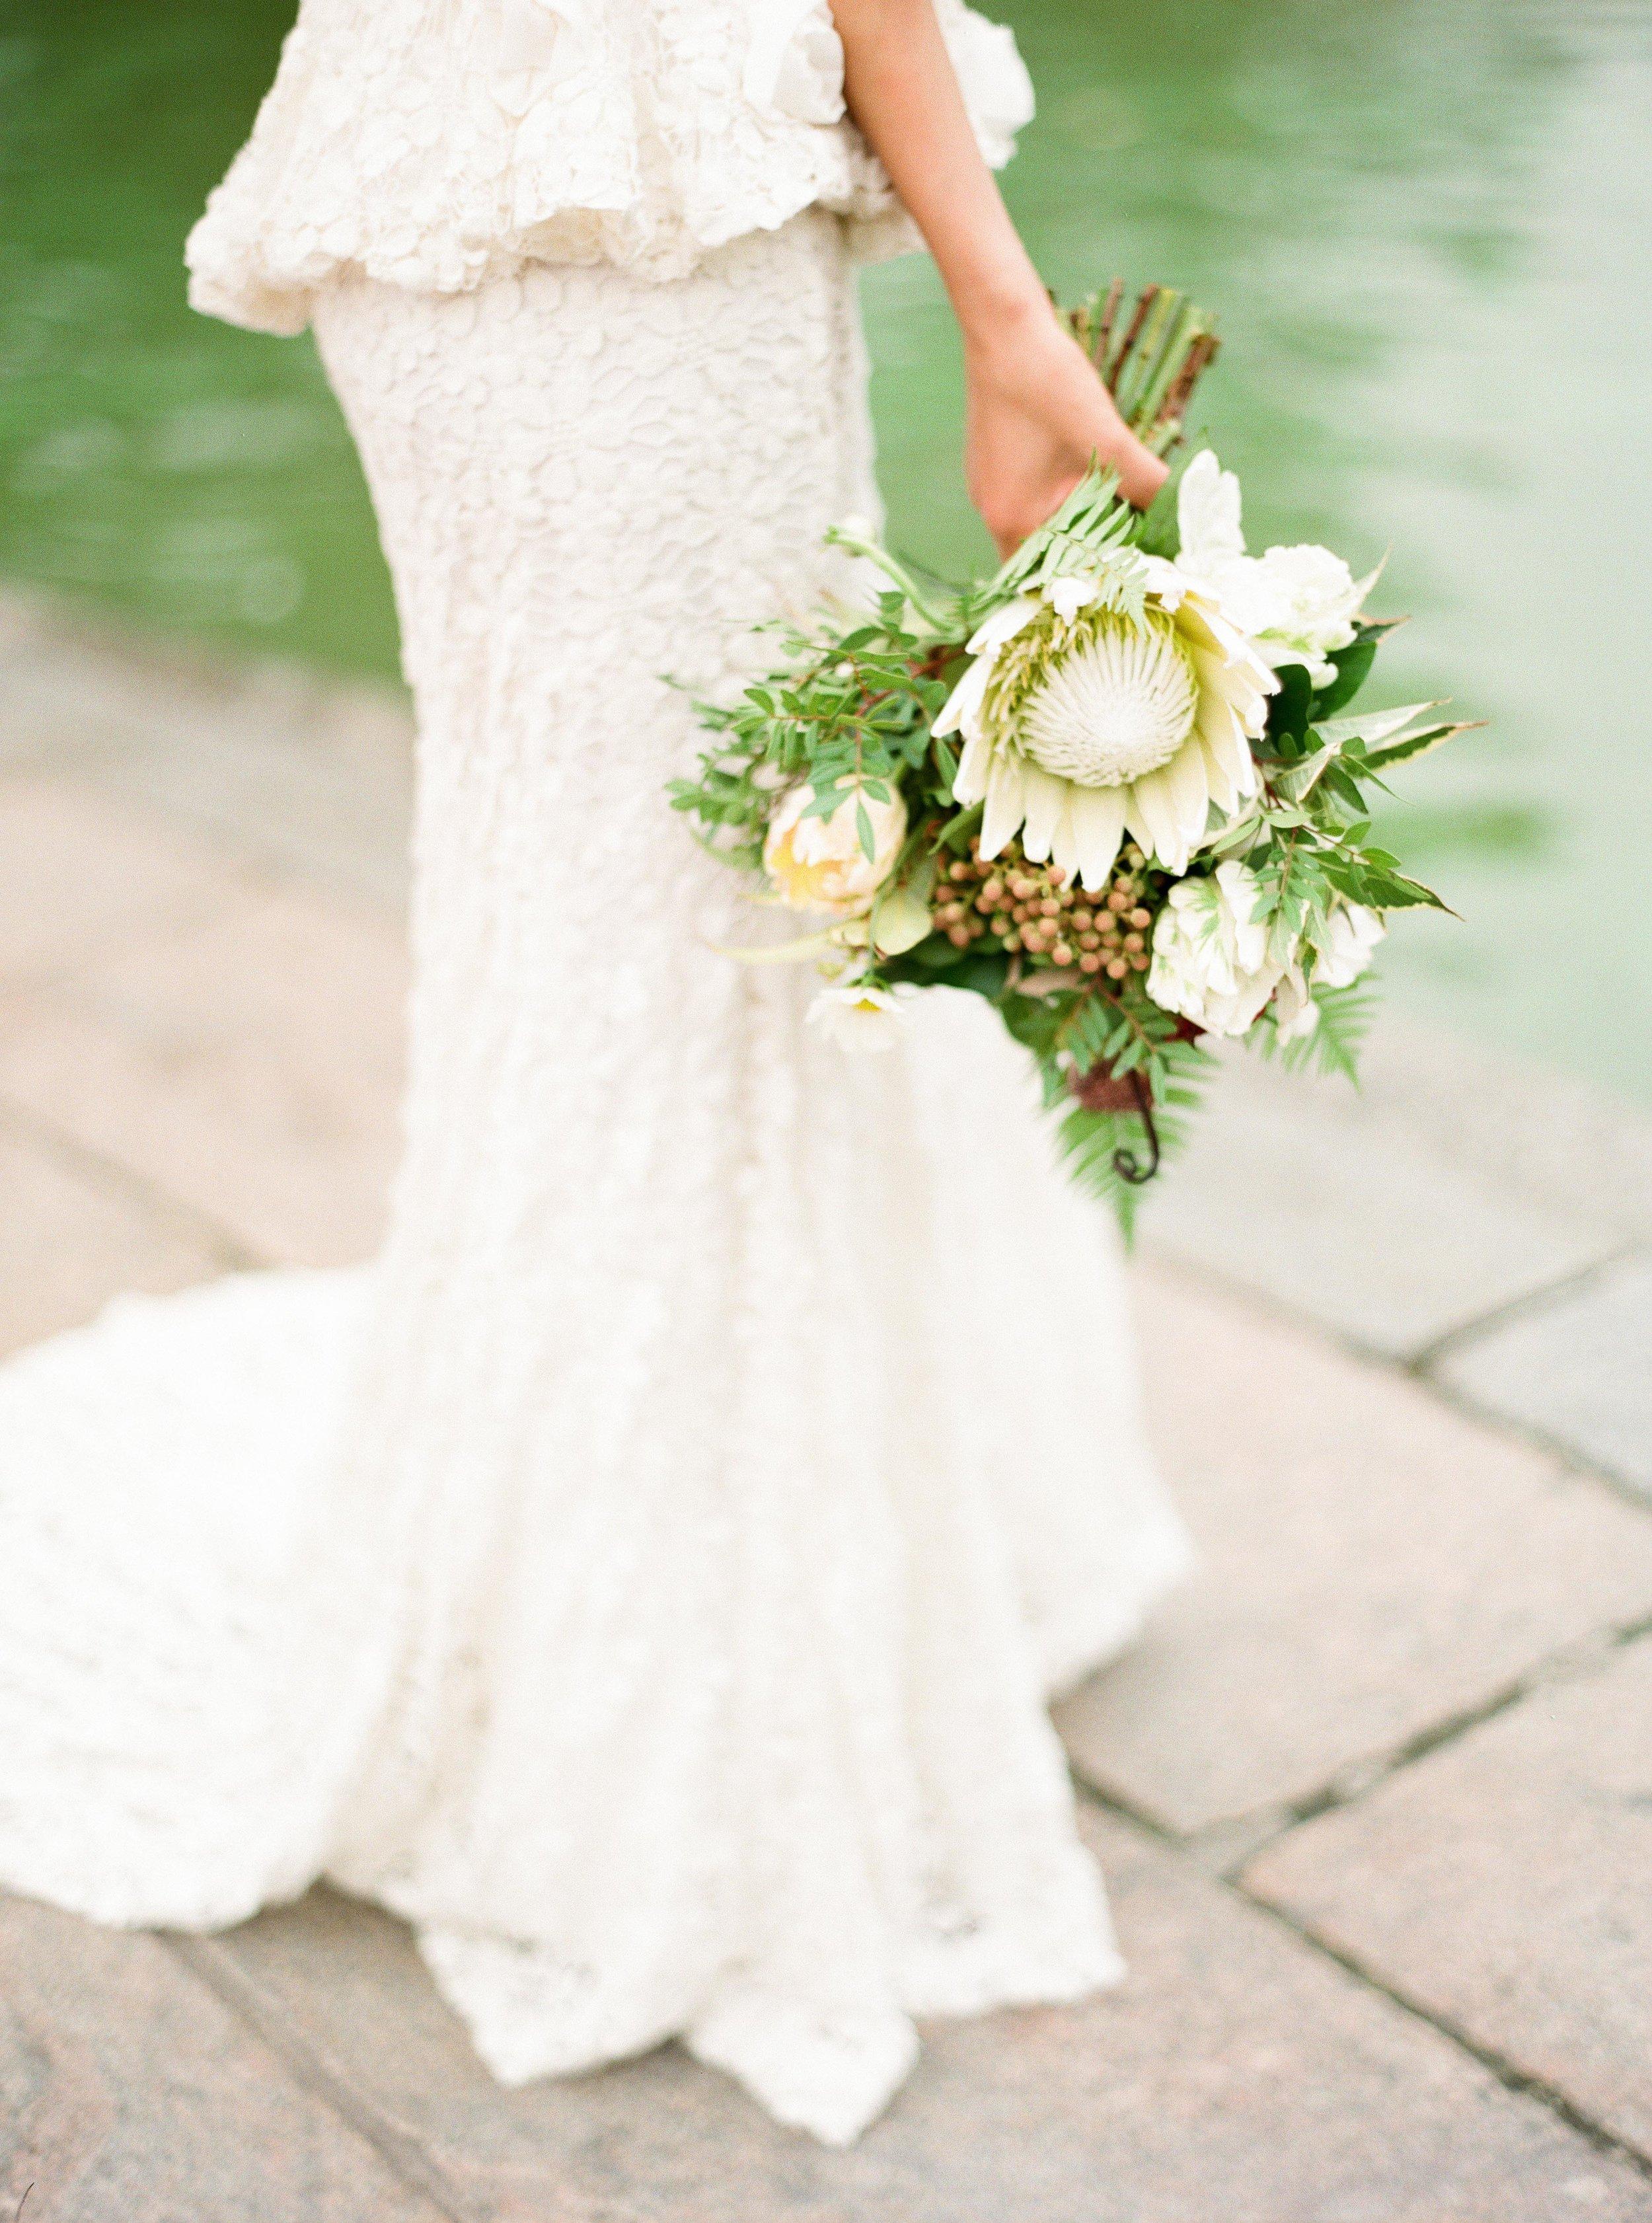 The Flower Bride